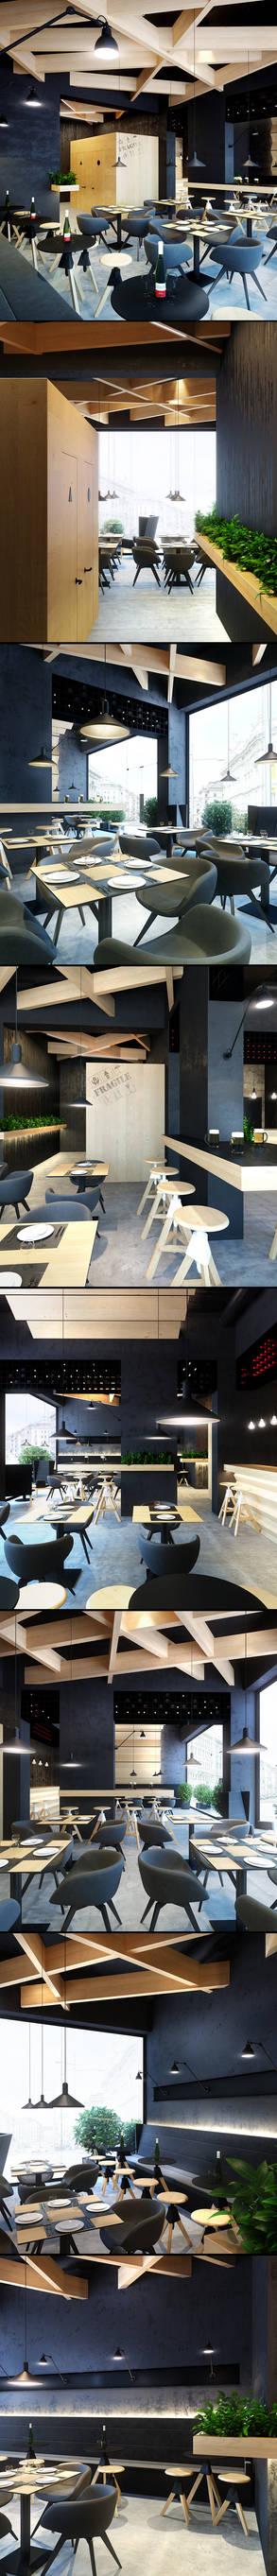 Bristol 2 caffee - bar